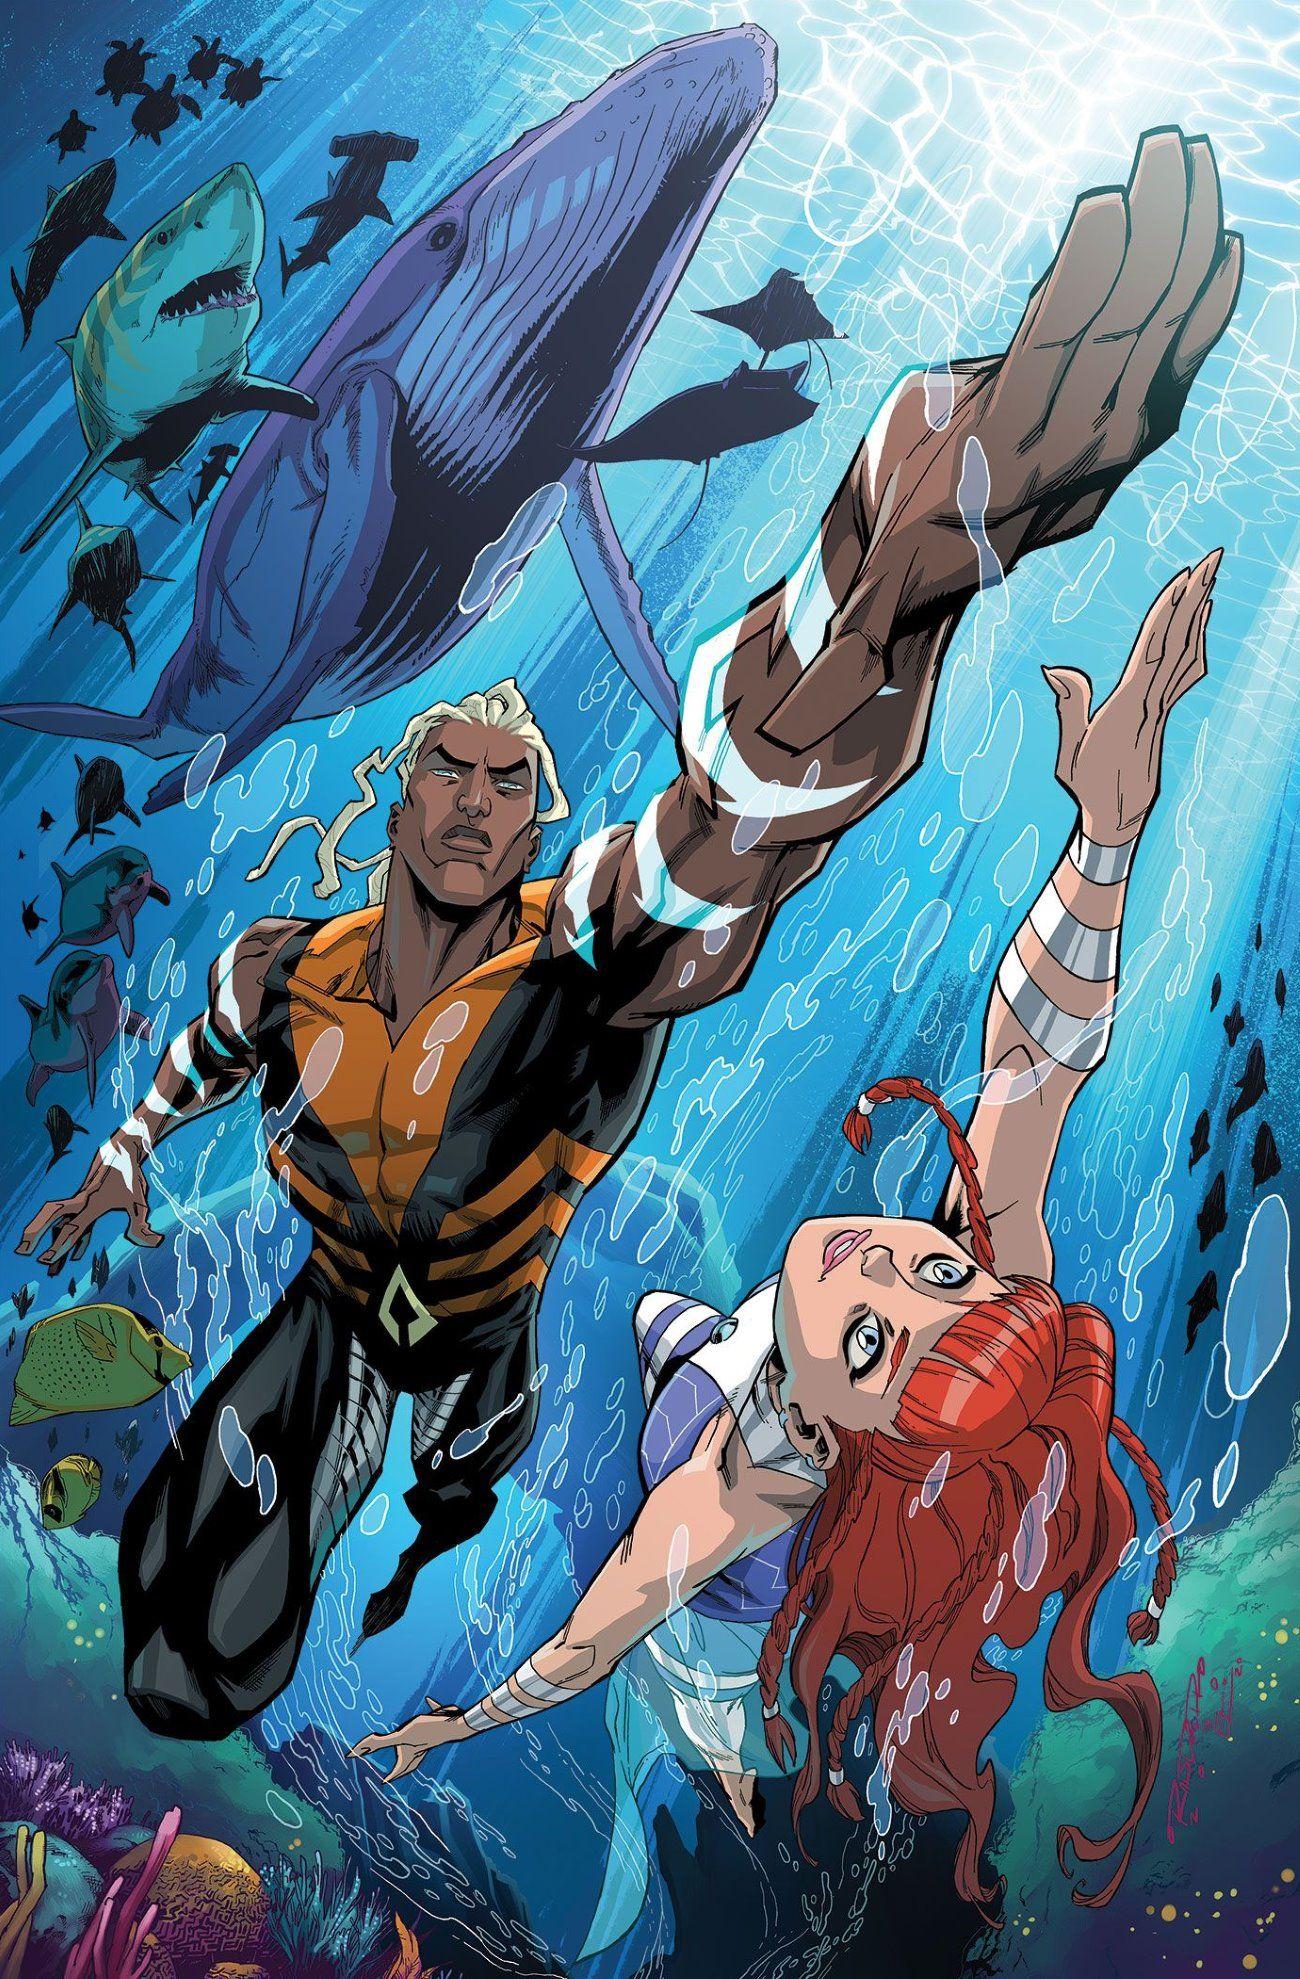 Aqualad do Young Justice se torna o novo Aquaman no futuro de DC 2